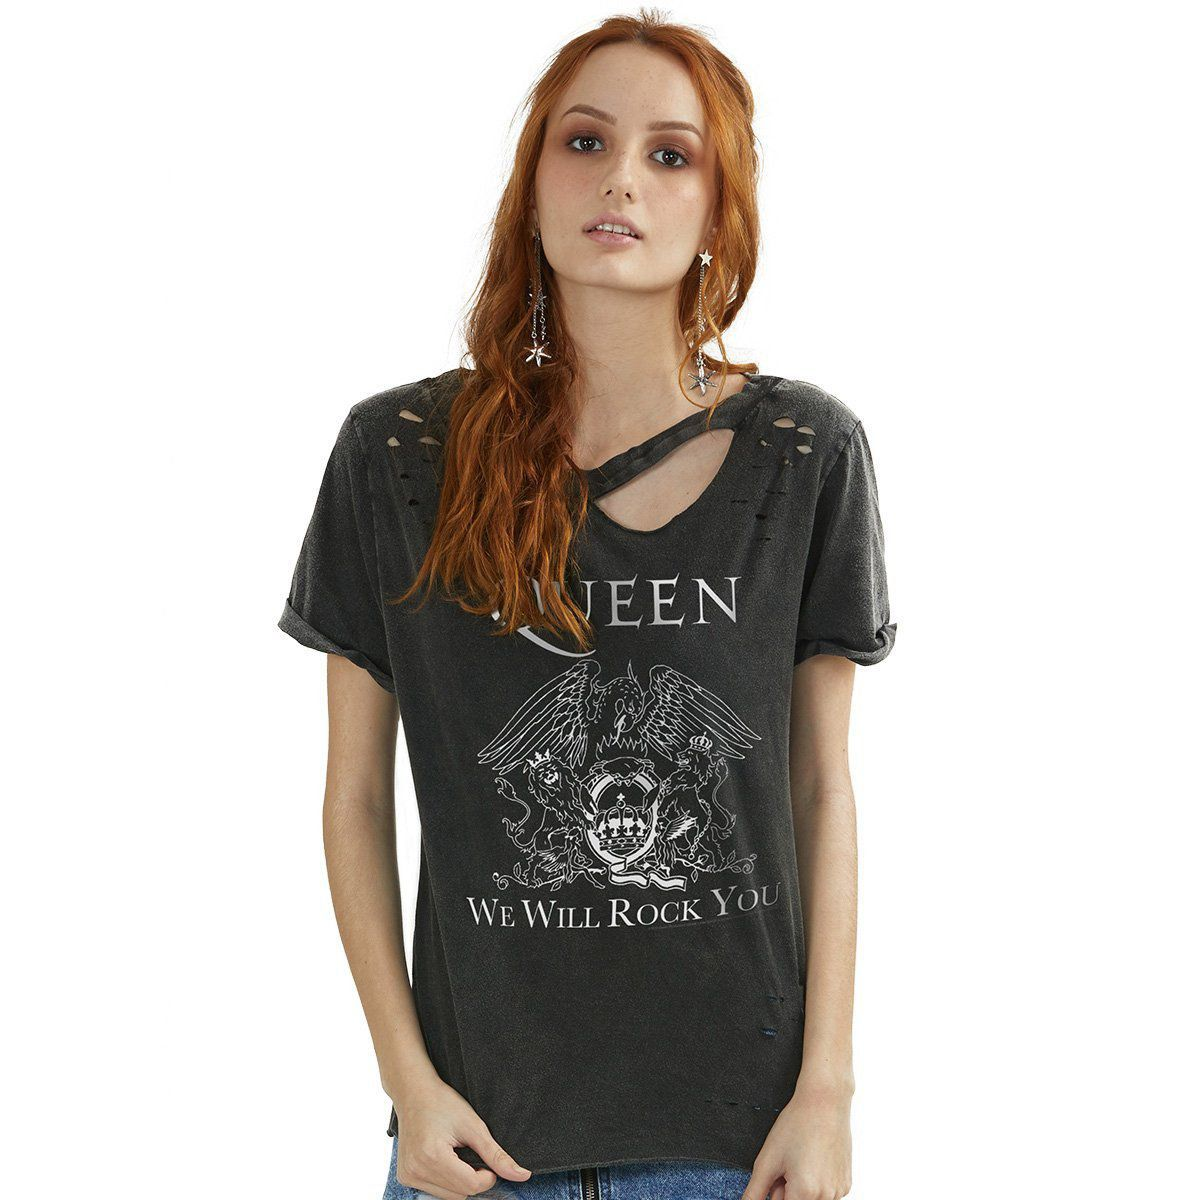 T-shirt Destroyed Feminina Queen We Will Rock You  - bandUP Store Marketplace